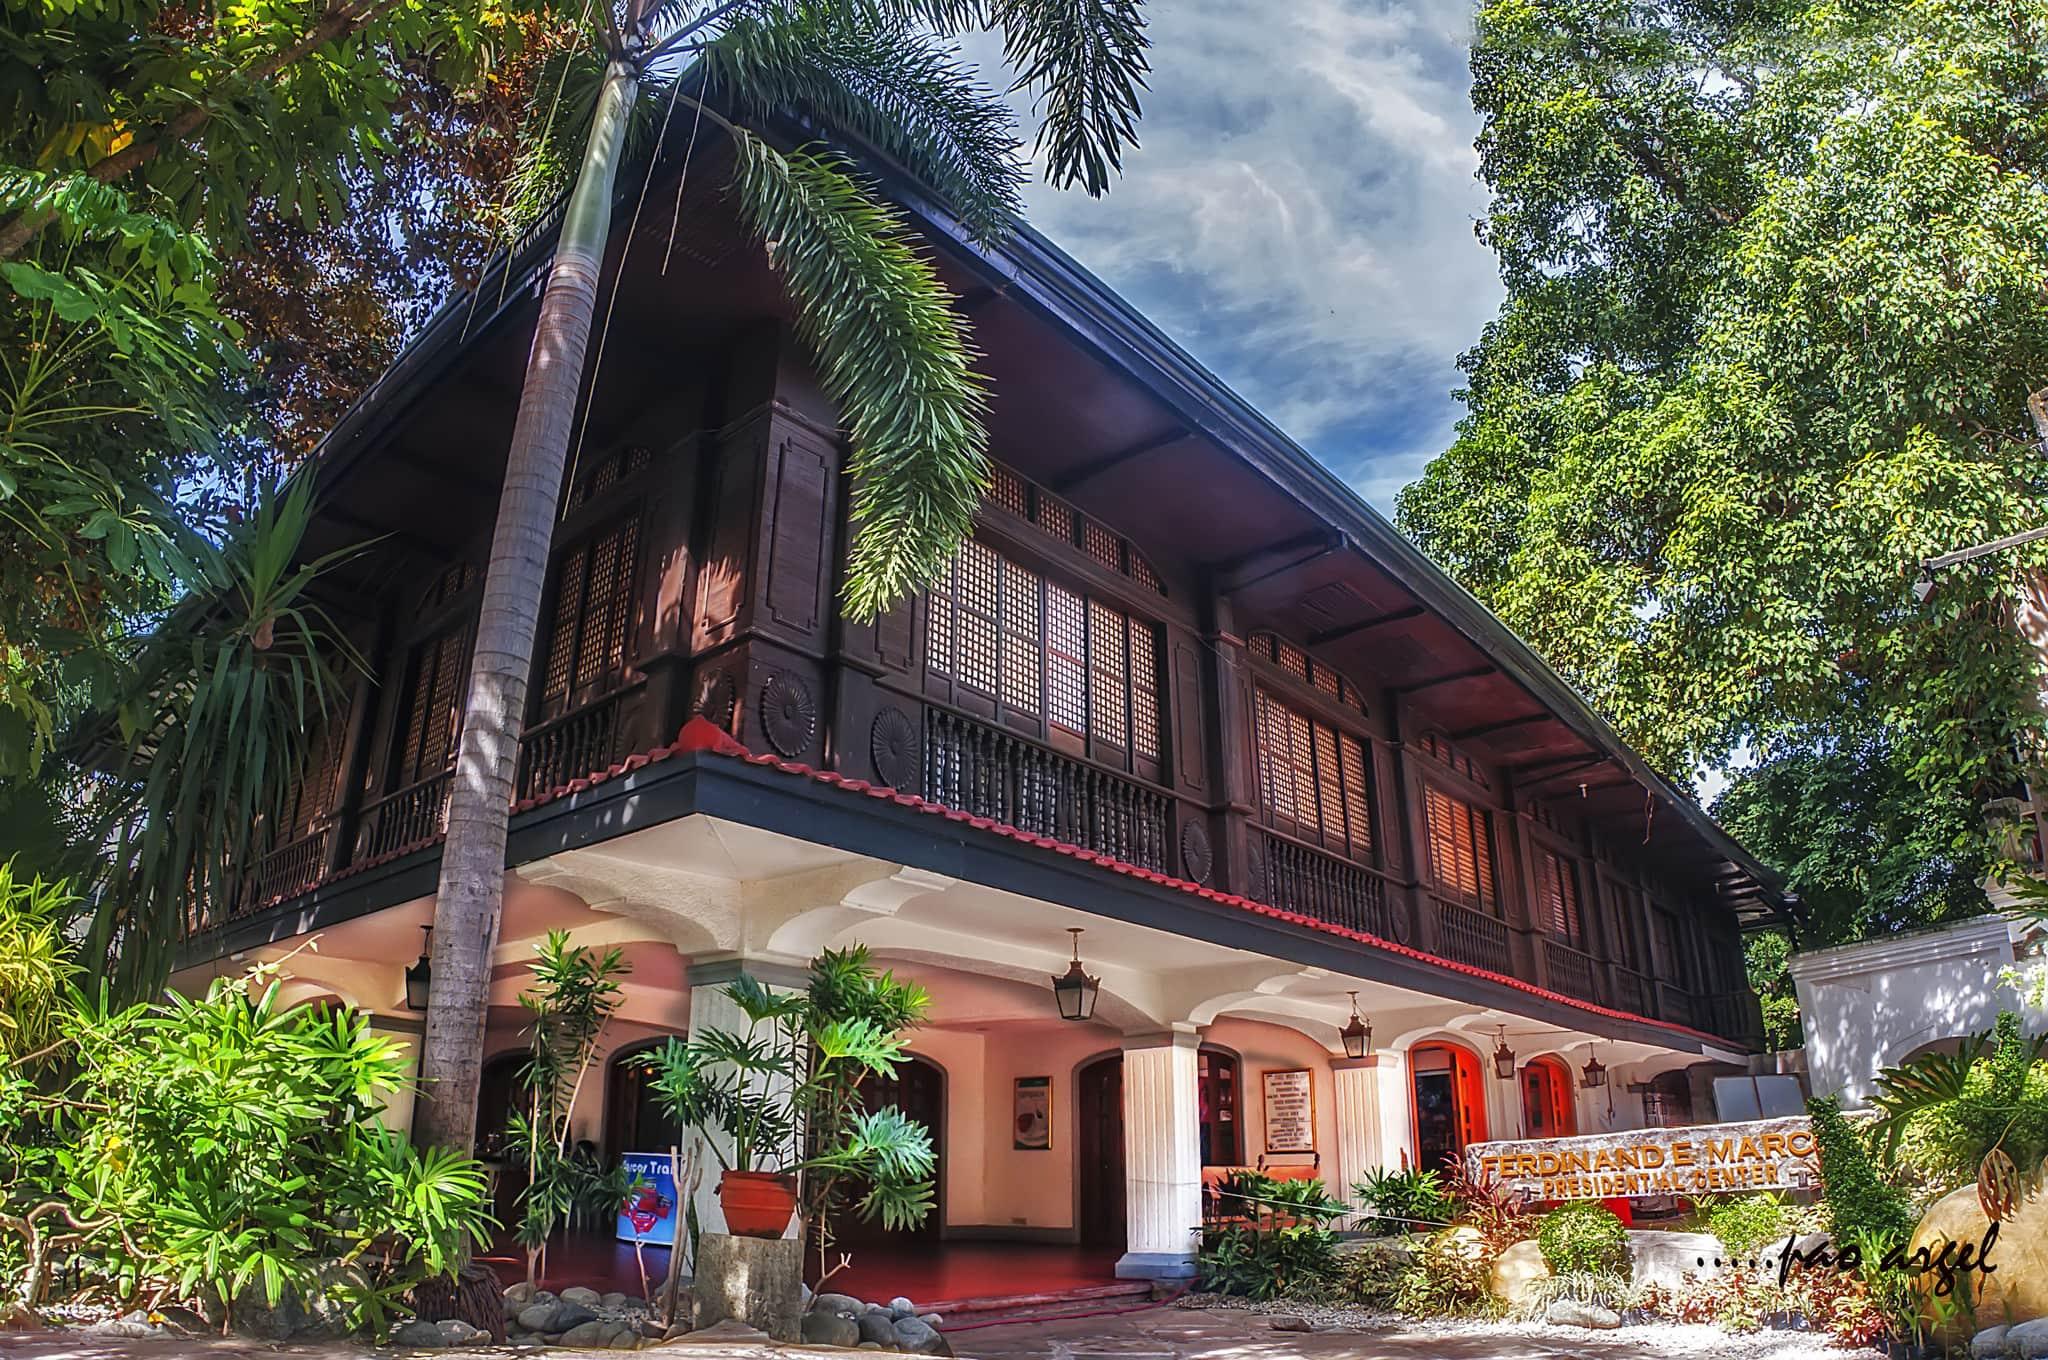 Ilocos Norte tourist spots, Marcos Museum and mausoleum, Ilocos Itinerary